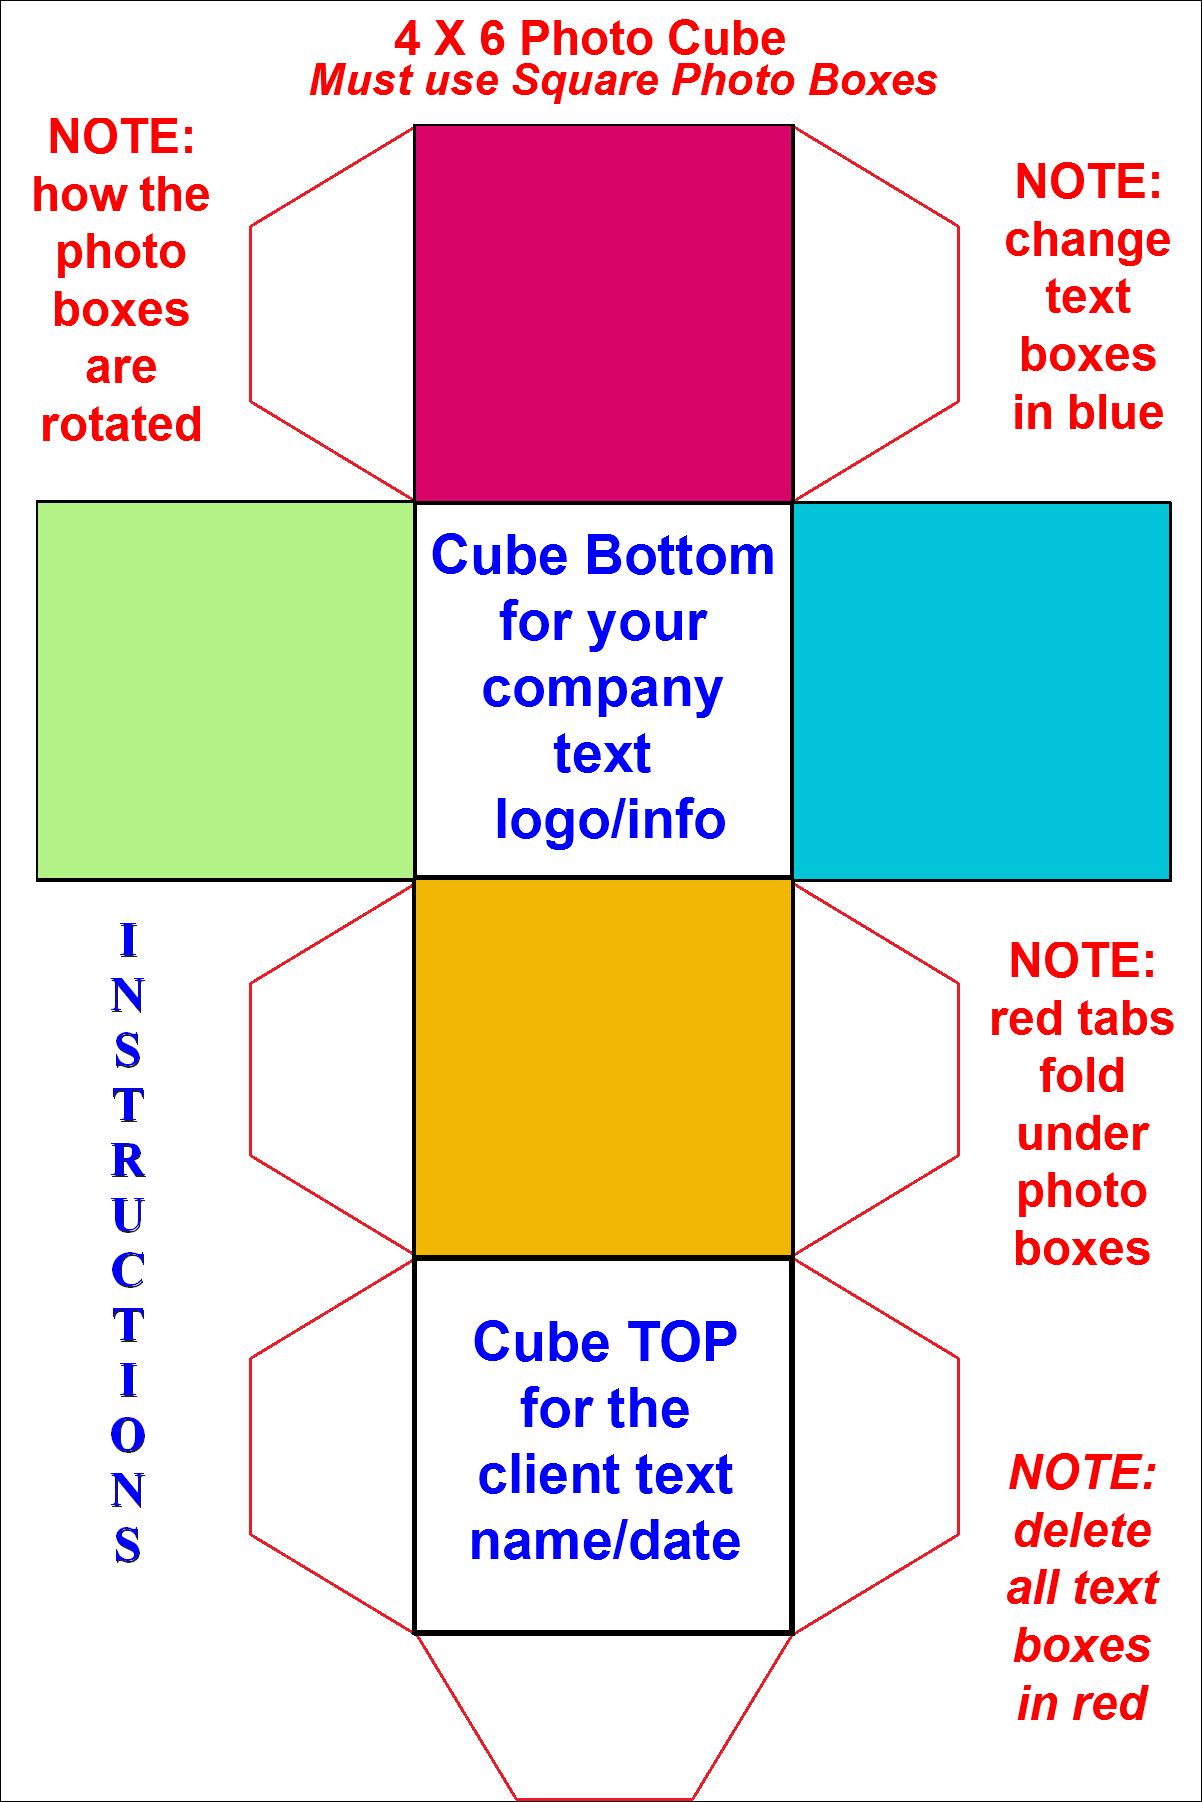 Cube_instructions_image